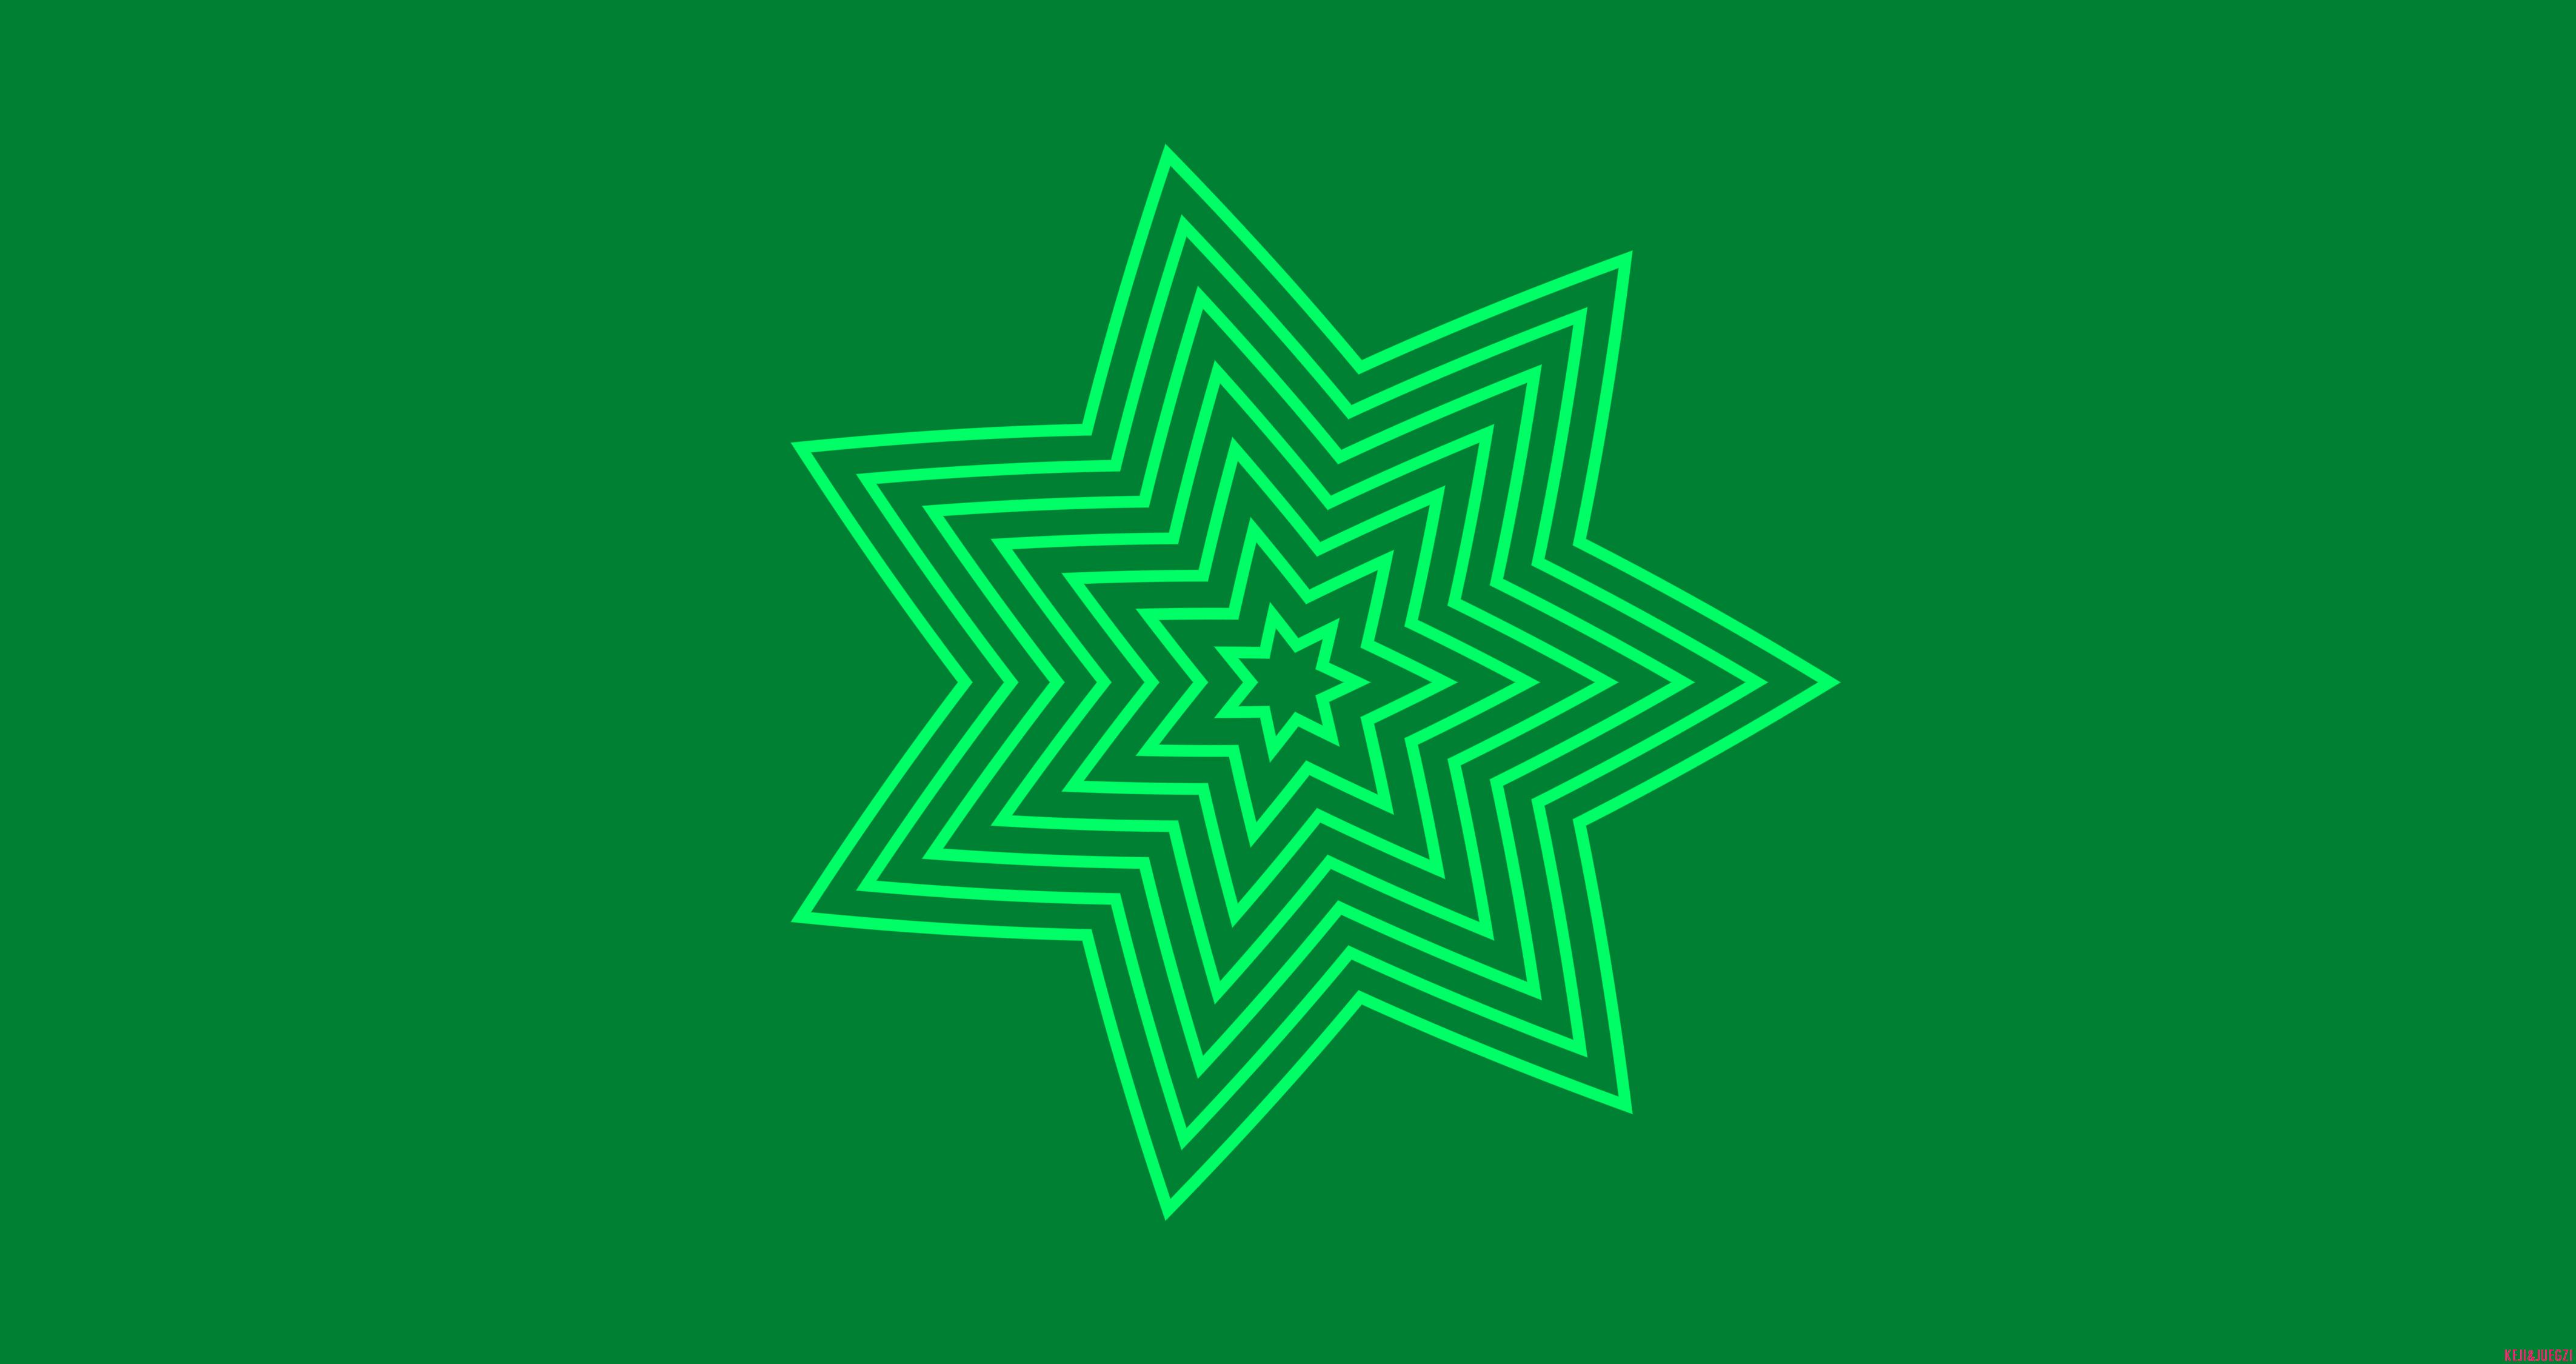 Kaleidoscope Digital Art Pattern Artistic Green 4250x2250